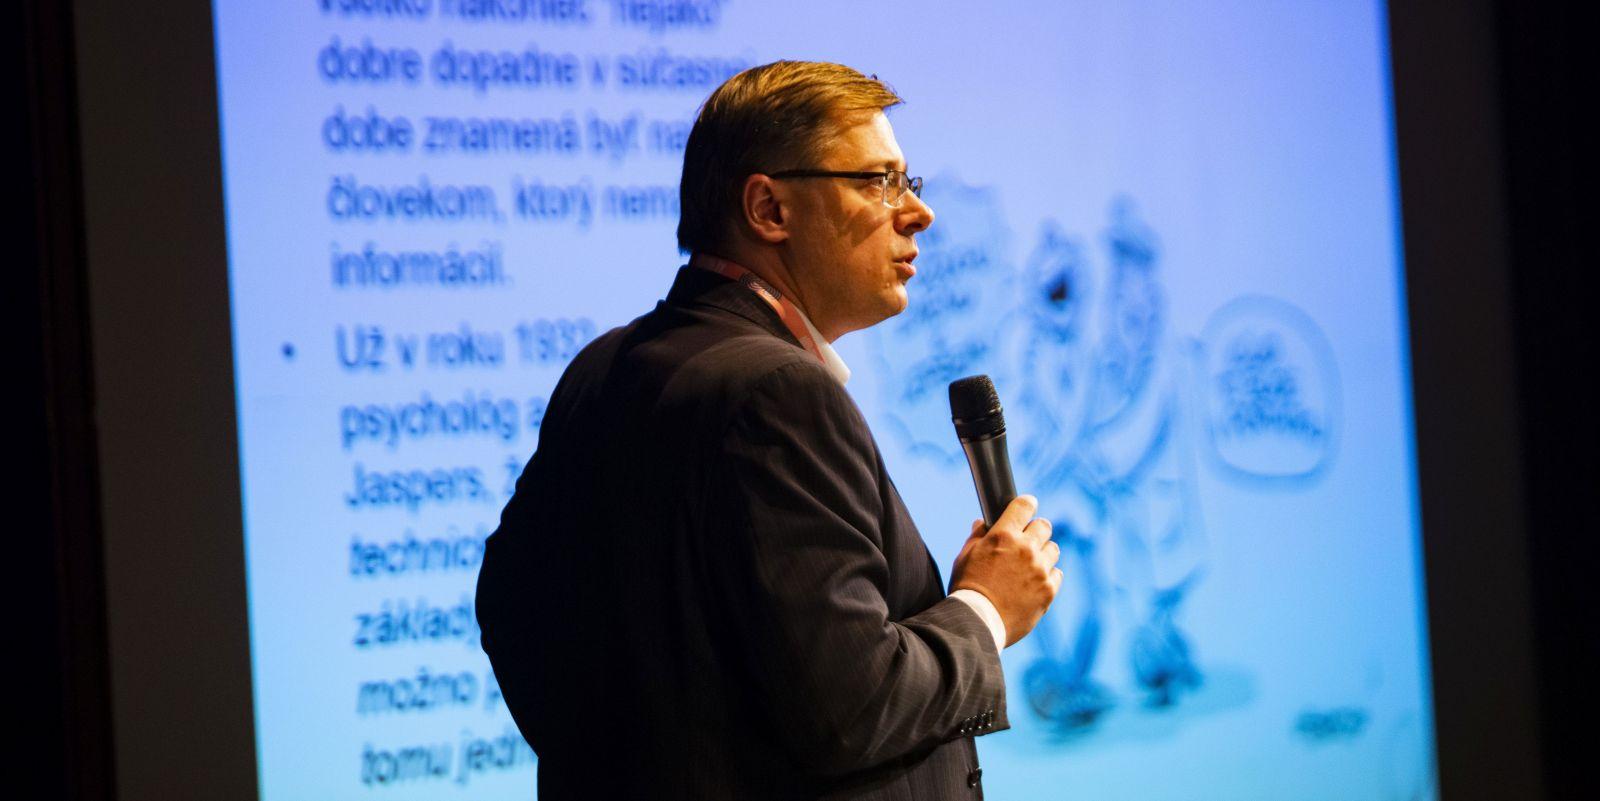 Sociológ Michal Vašečka